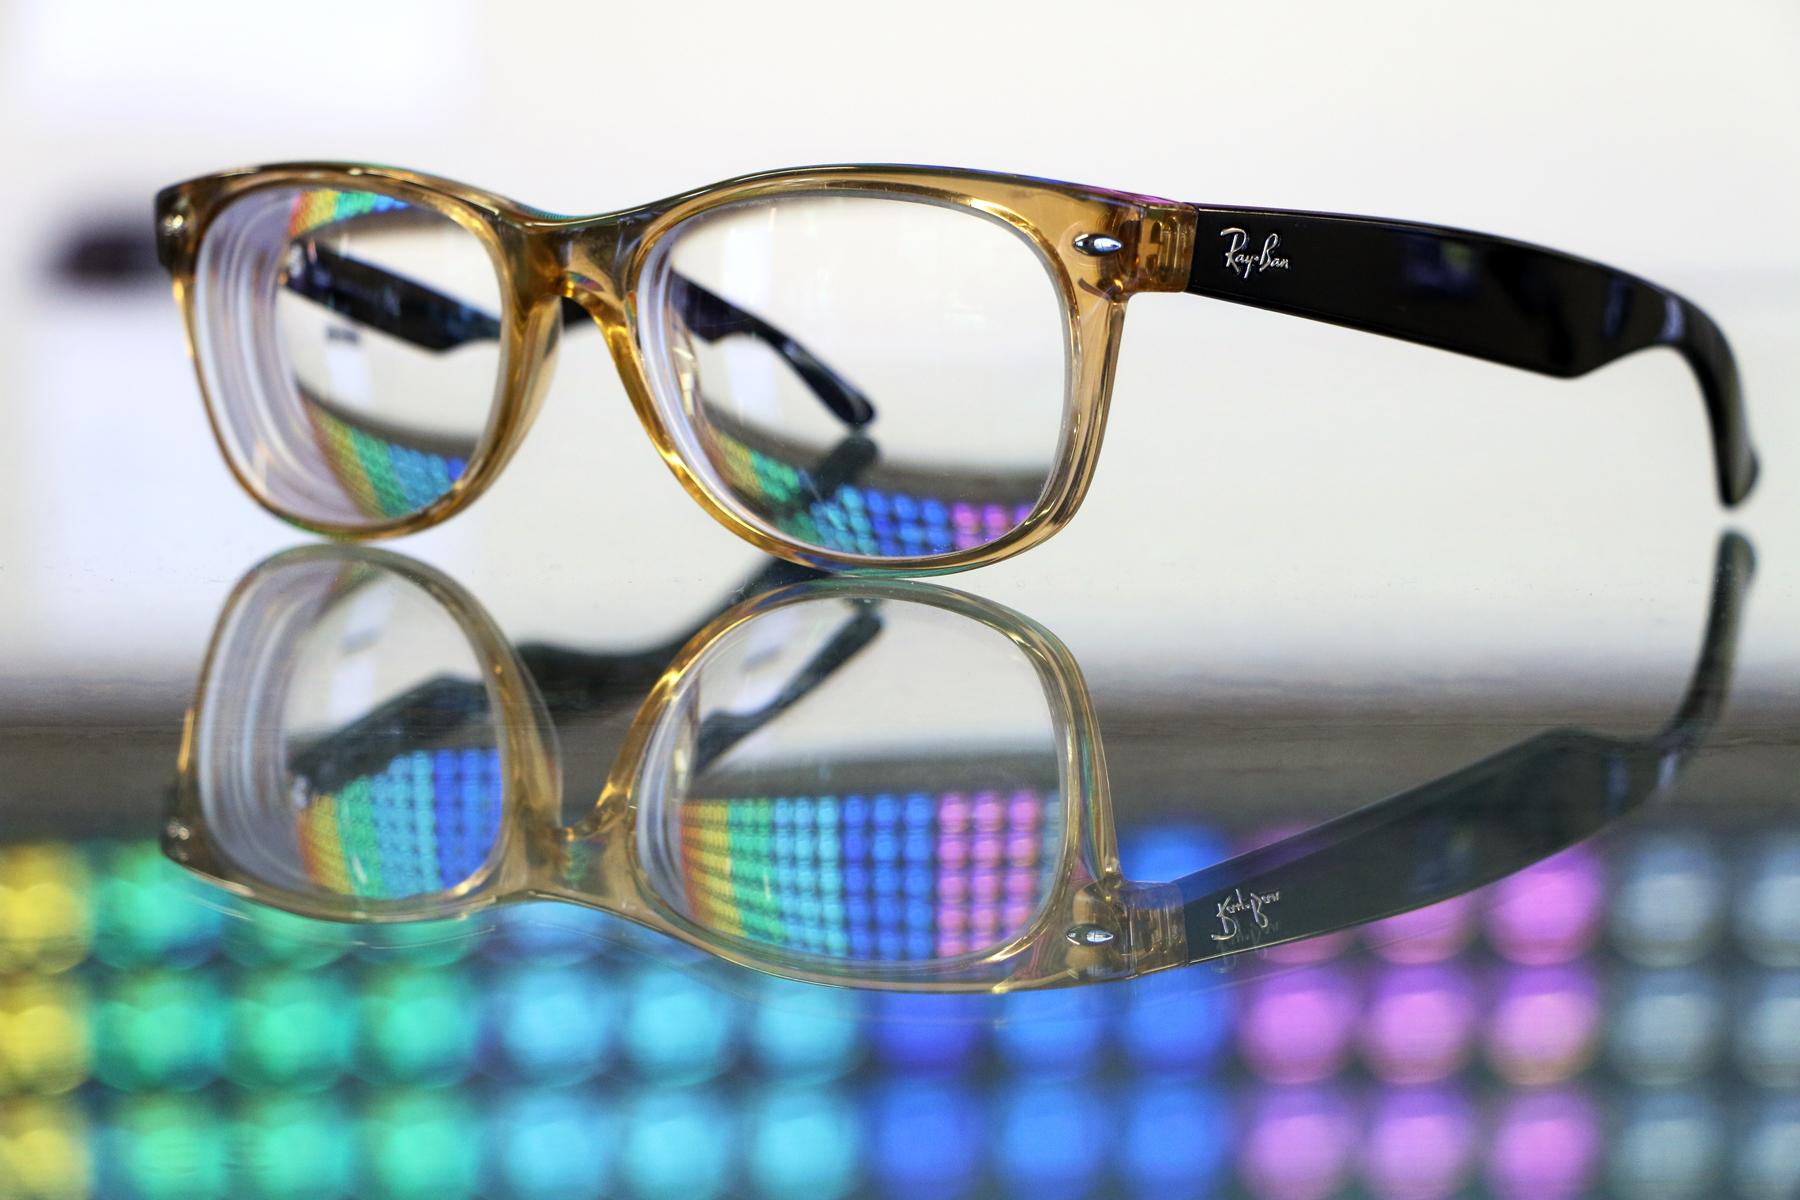 c36887b833 Original Wayfarers with clear prescription lenses